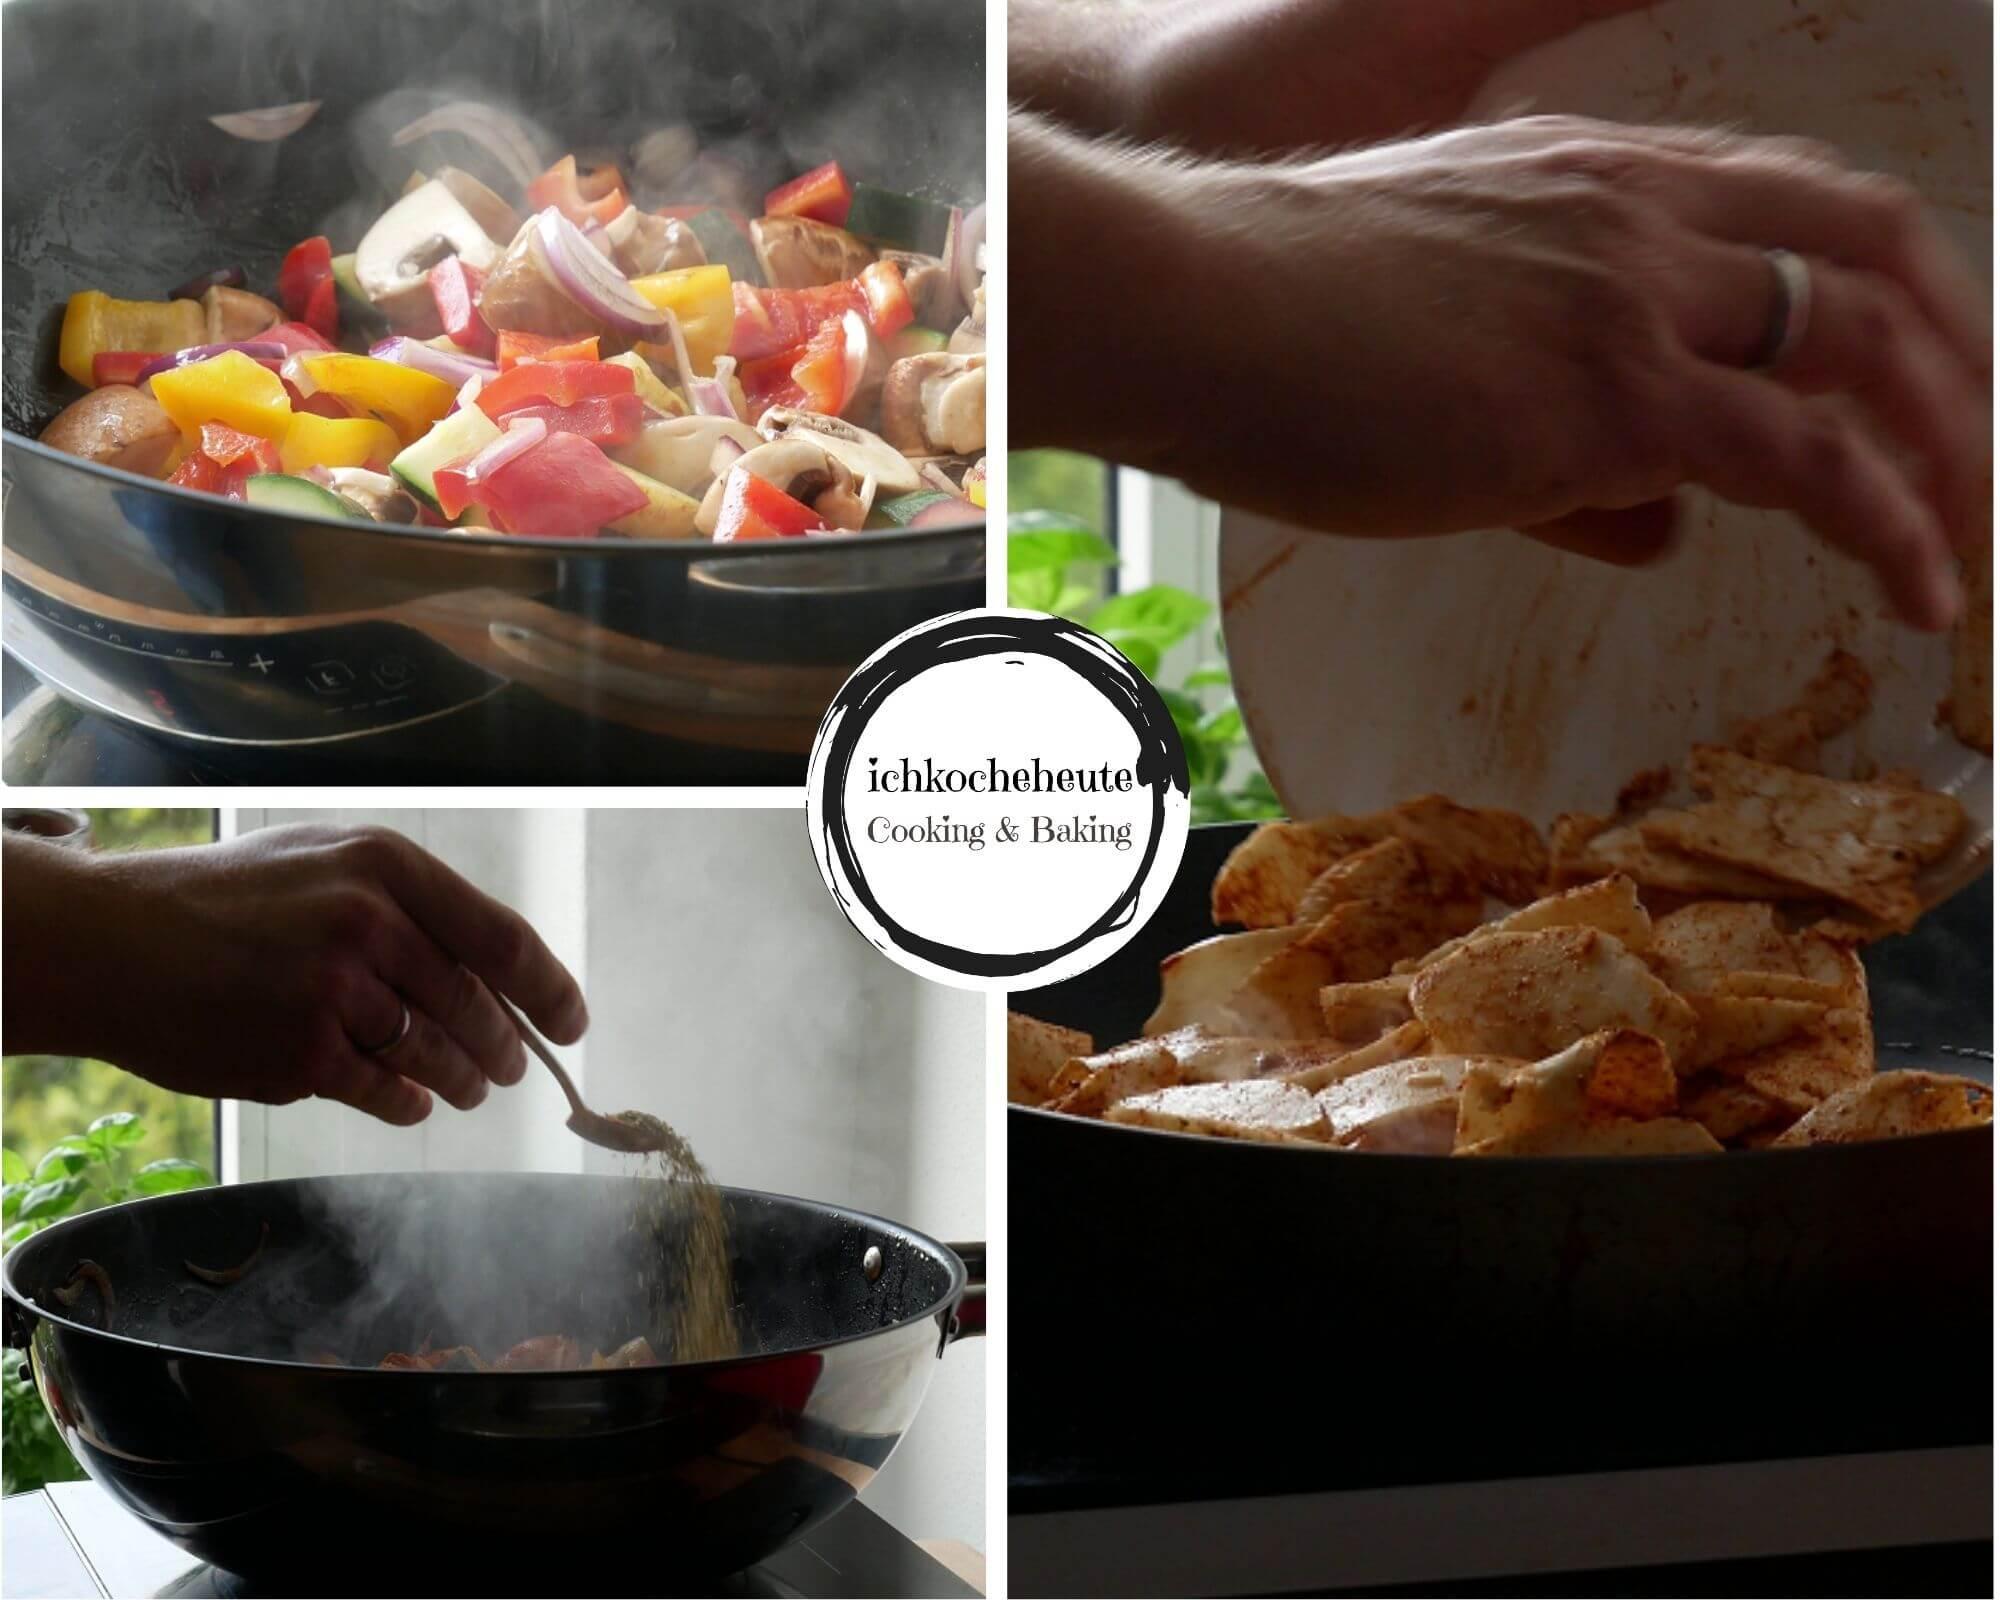 Frying Veggies & Halloumi